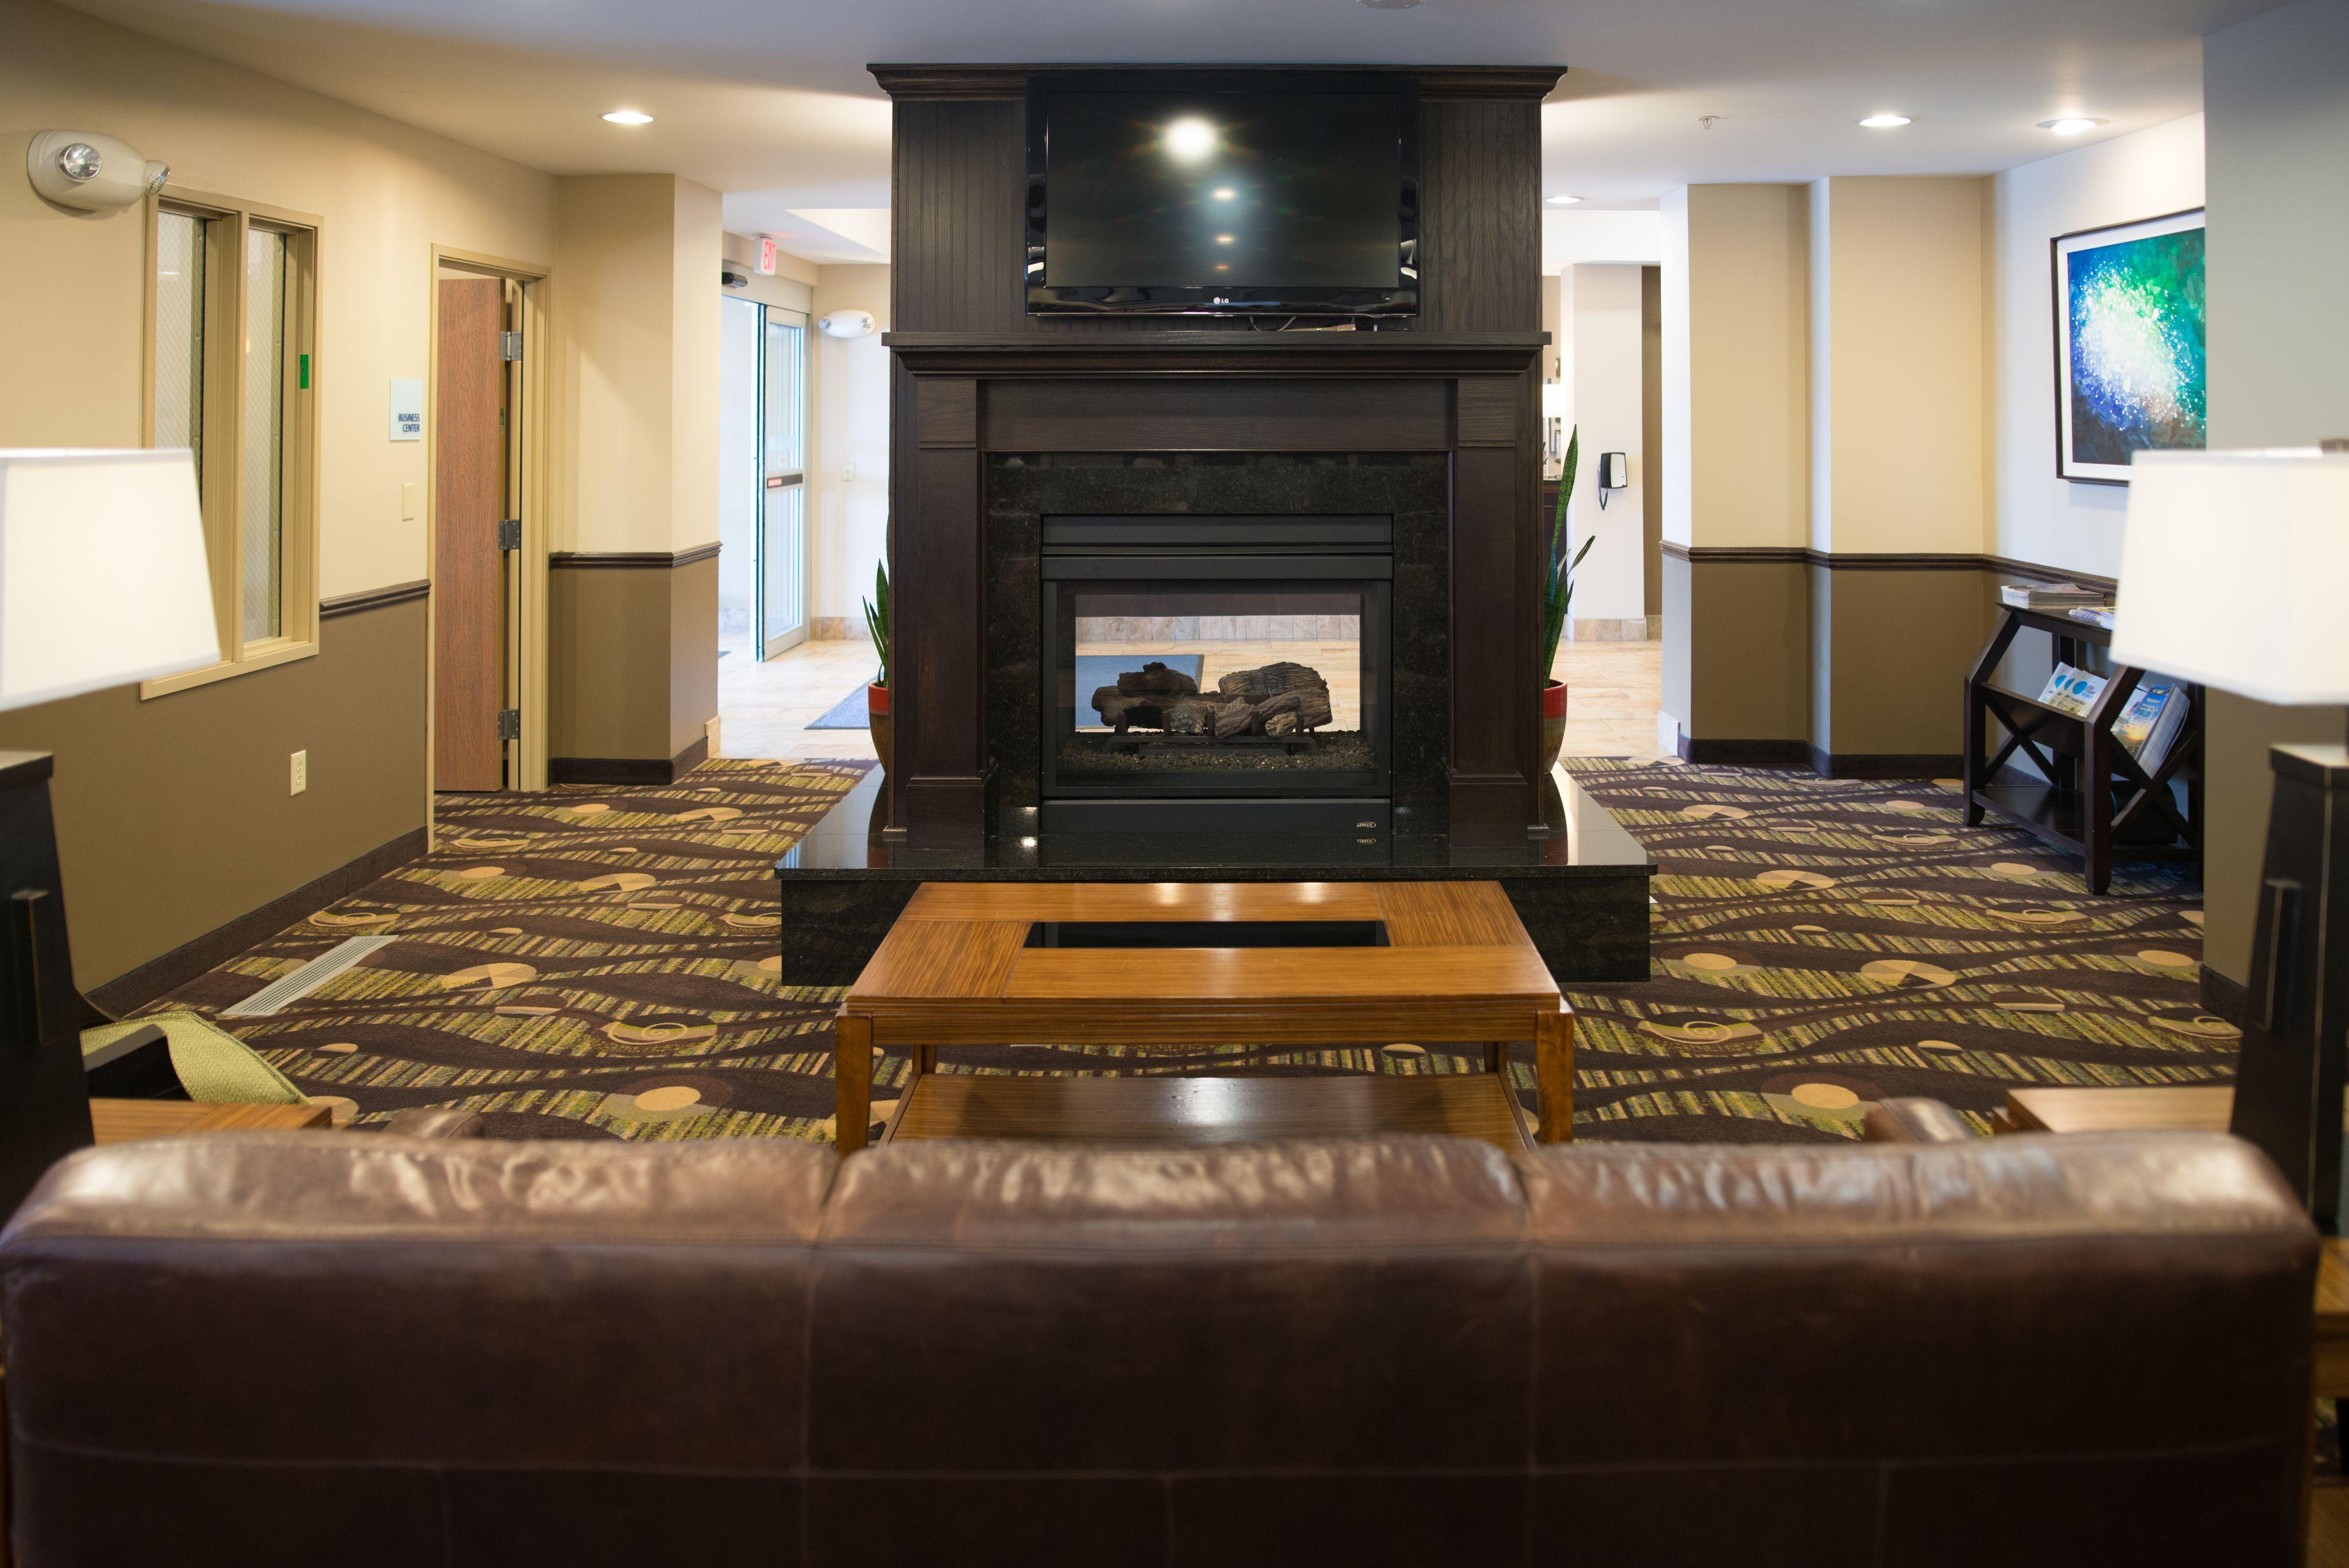 Holiday Inn Express & Suites Northwood image 6